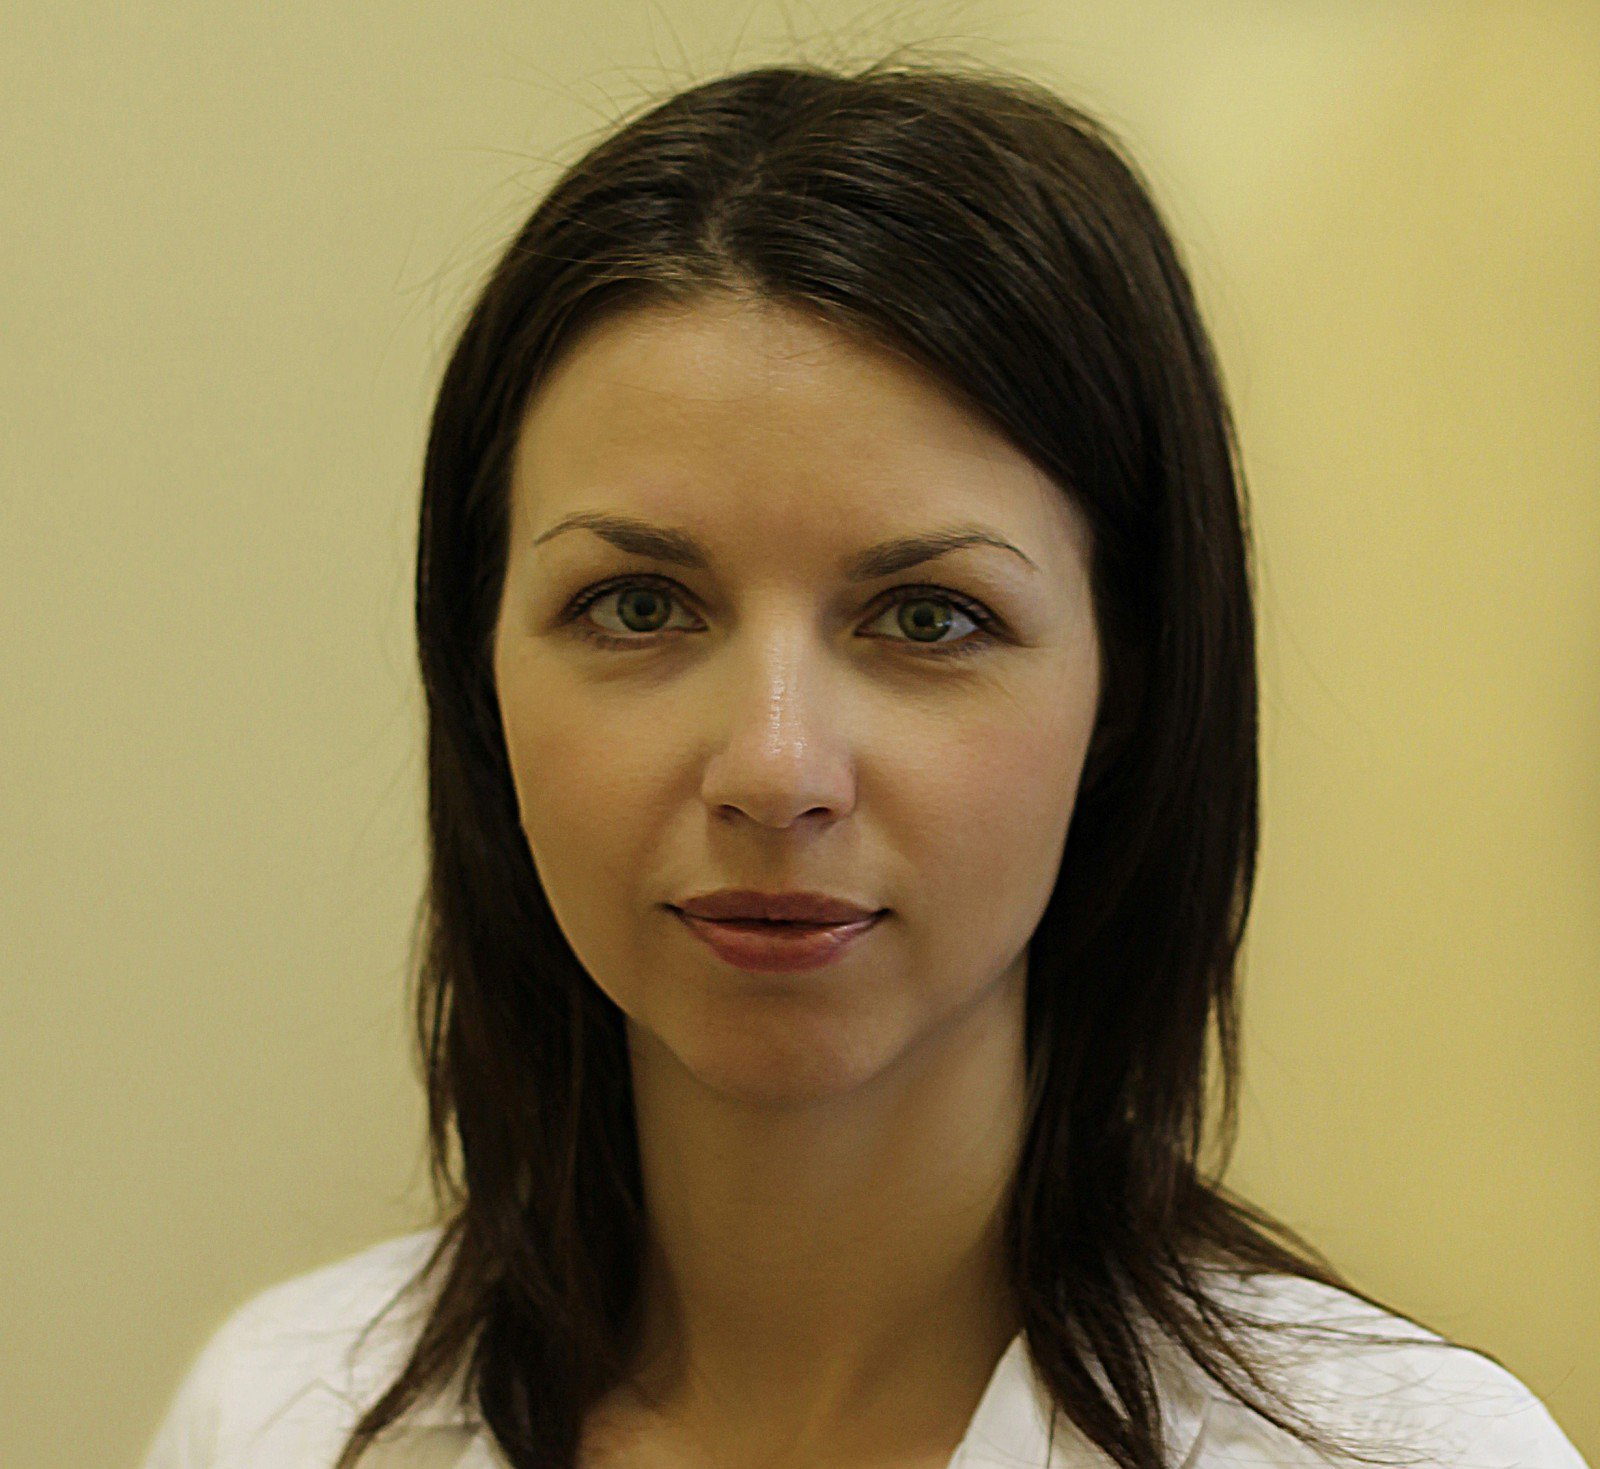 Гусятинская Юлия Николаевна